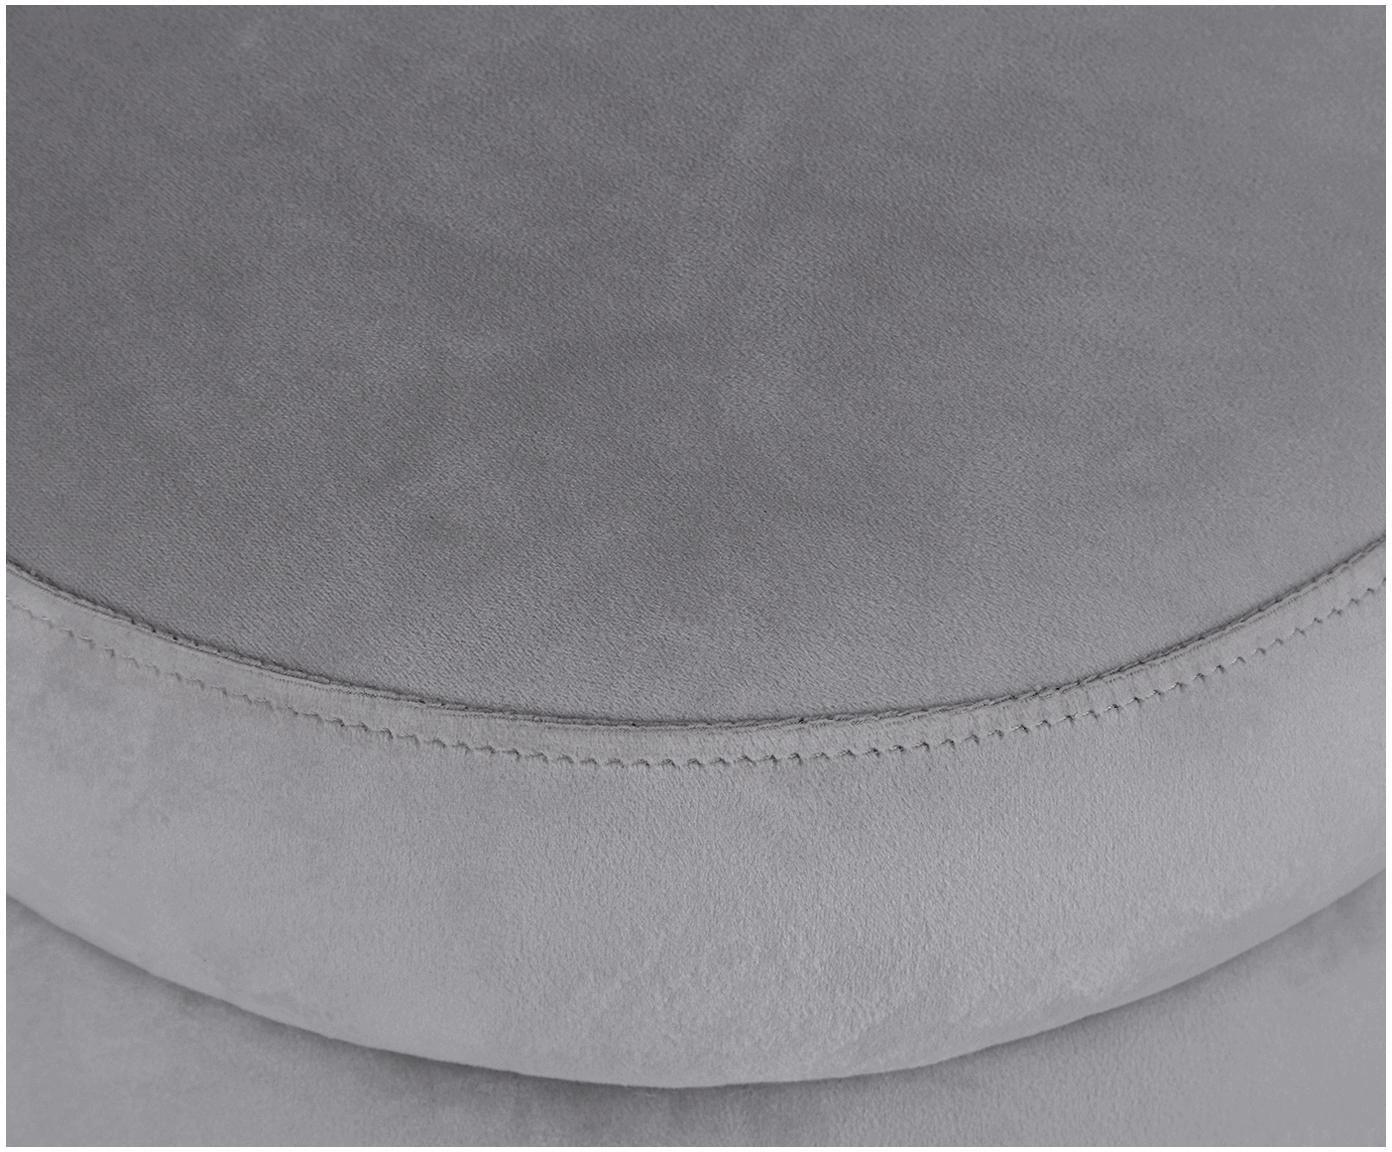 Samt-Hocker Alto, Bezug: Samt (Polyester) 30.000 S, Gestell: Sperrholz, Samt Grau, Ø 42 x H 48 cm